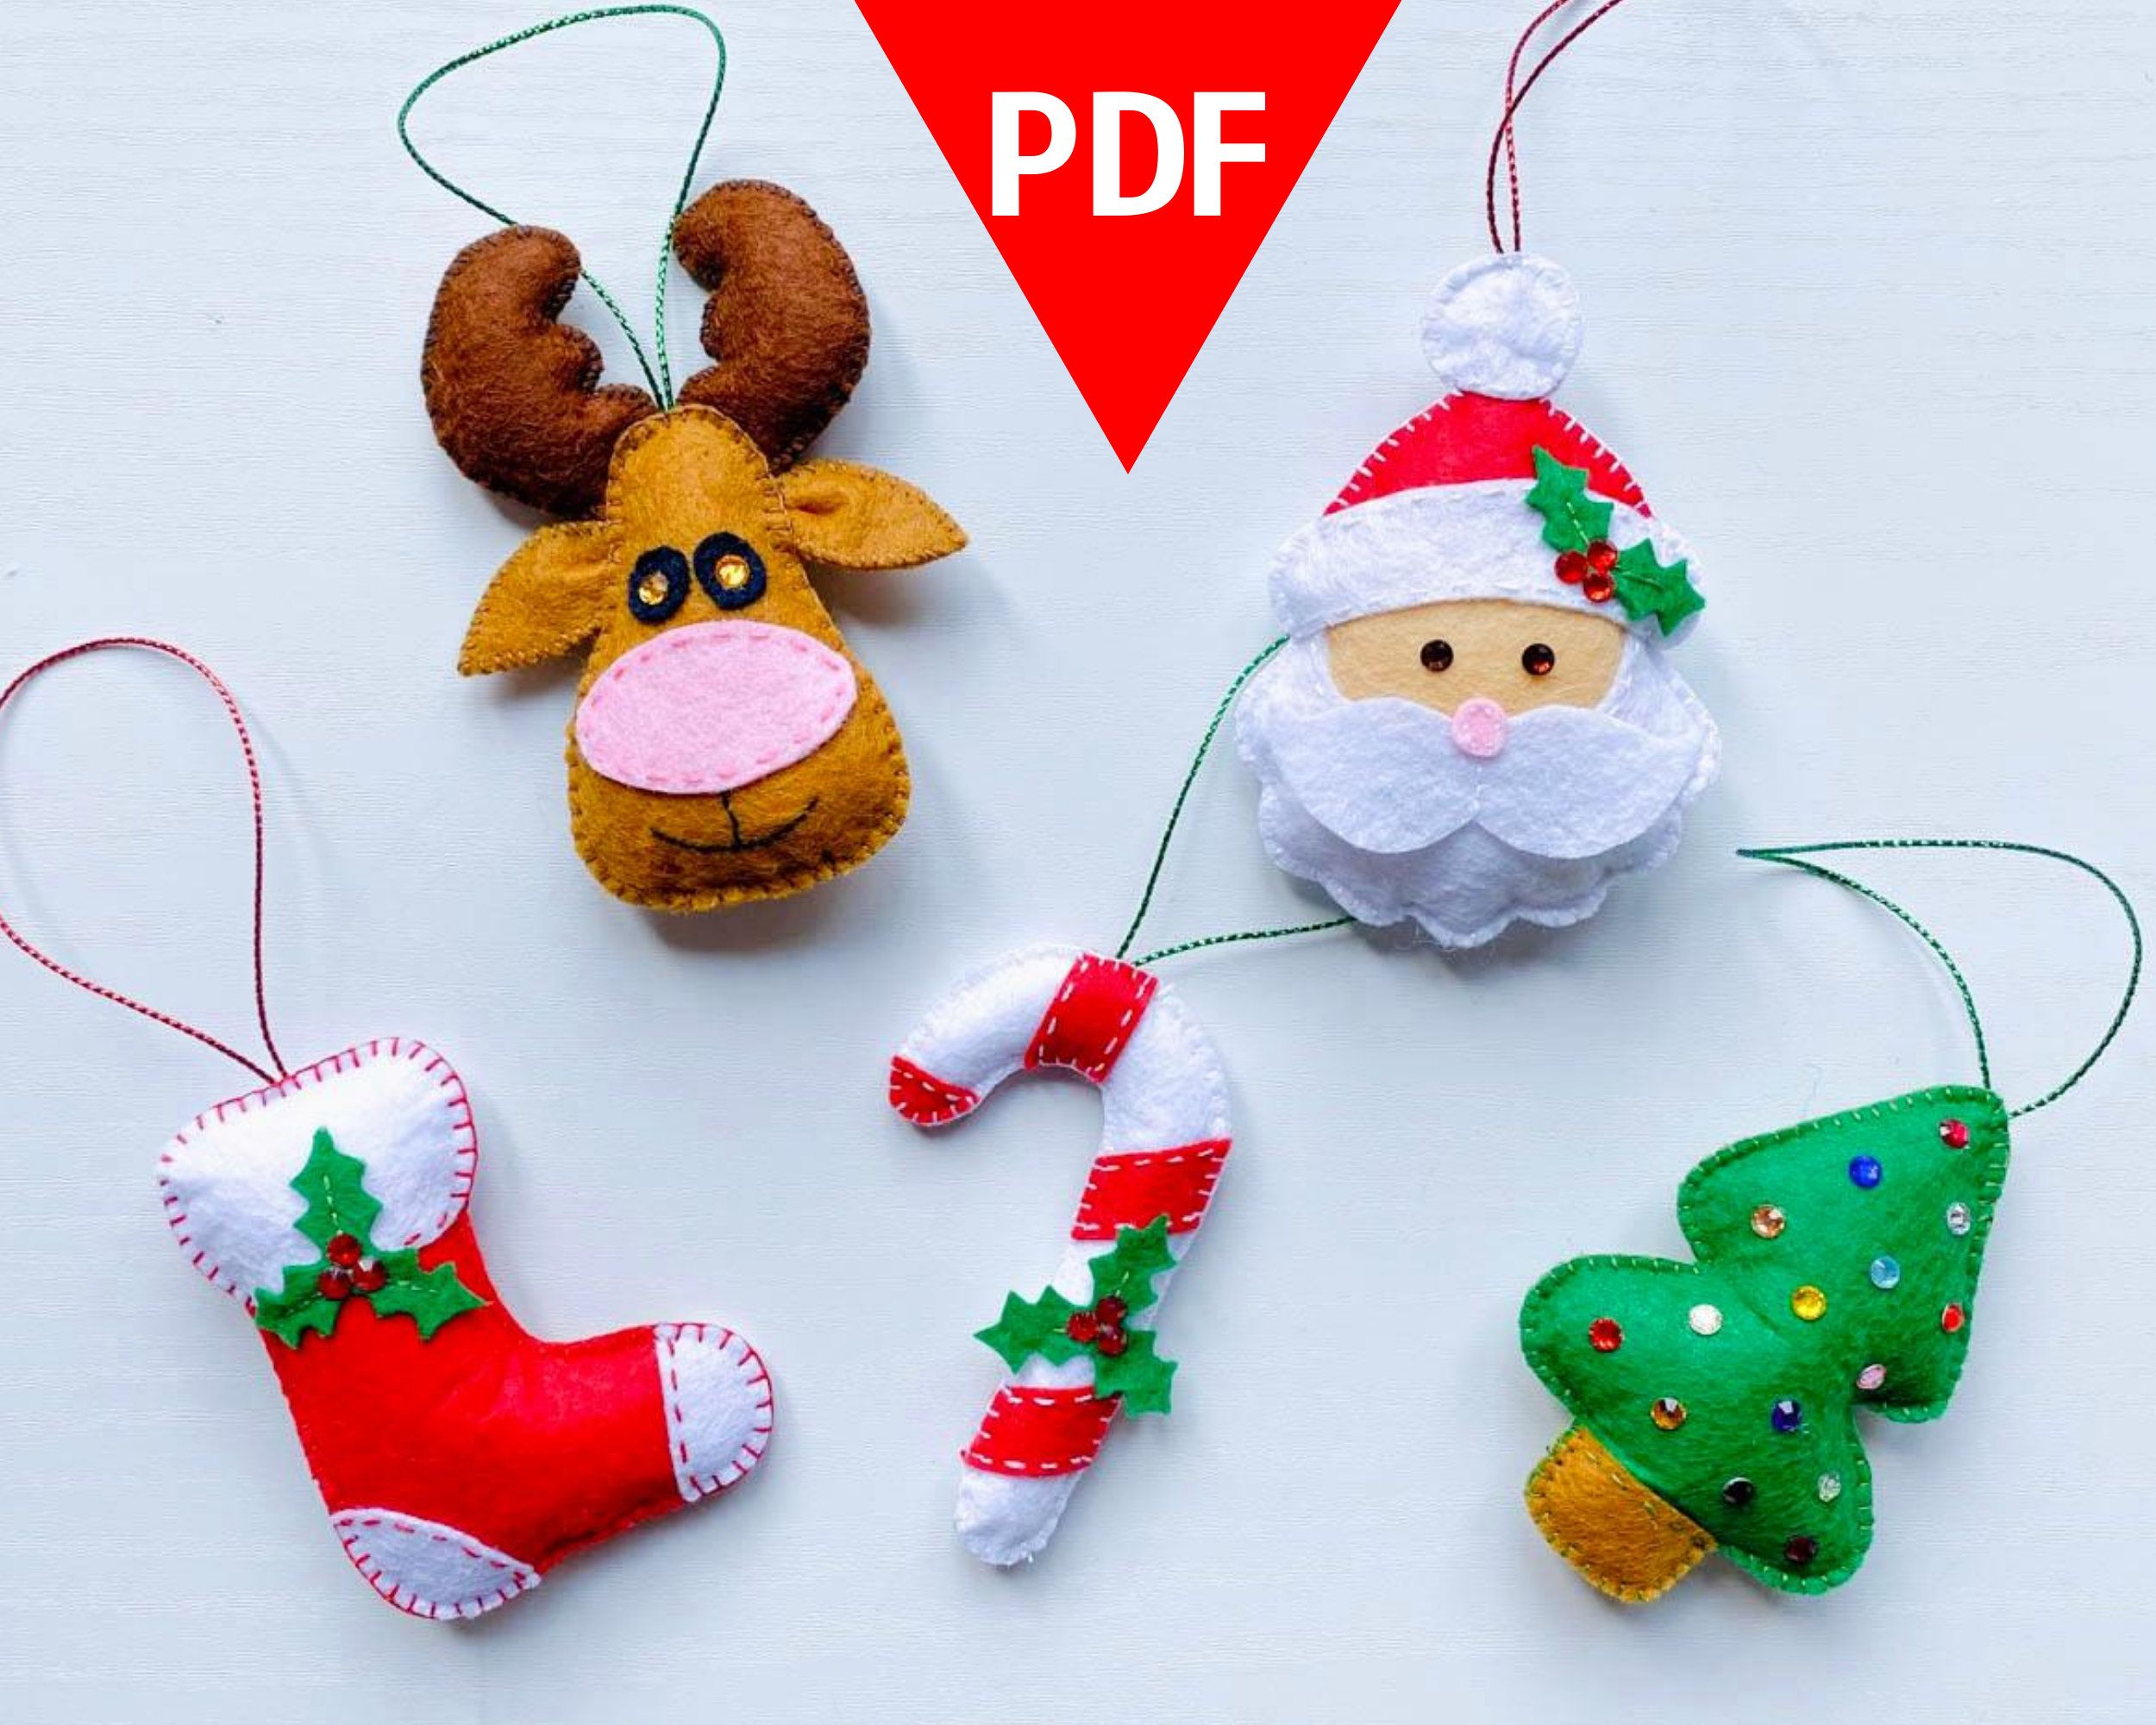 Felt Christmas Ornaments Pattern Pdf Set Of 5 Felt Toys Etsy Felt Christmas Ornaments Christmas Ornament Pattern Felt Christmas